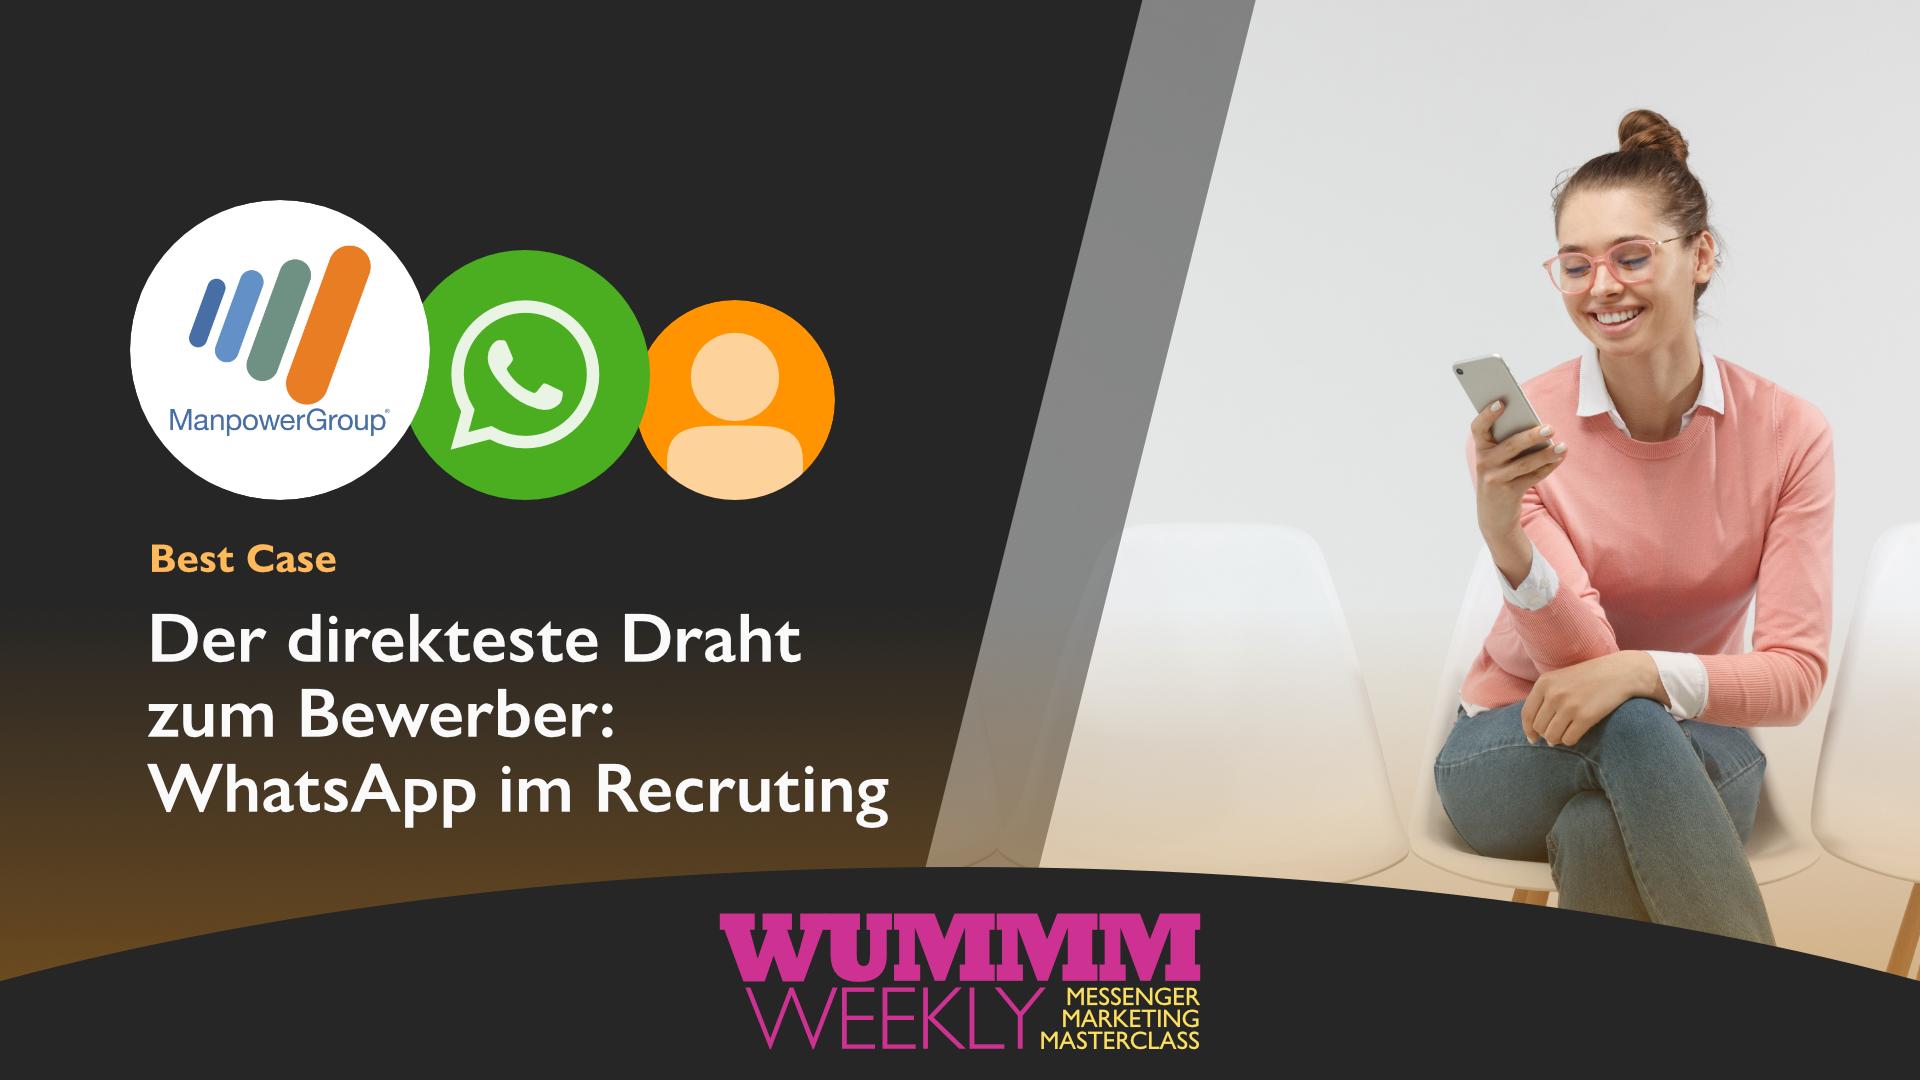 Wummm-weekly, Logo ManpowerGroup, Best Case, WhatsApp im Recruting